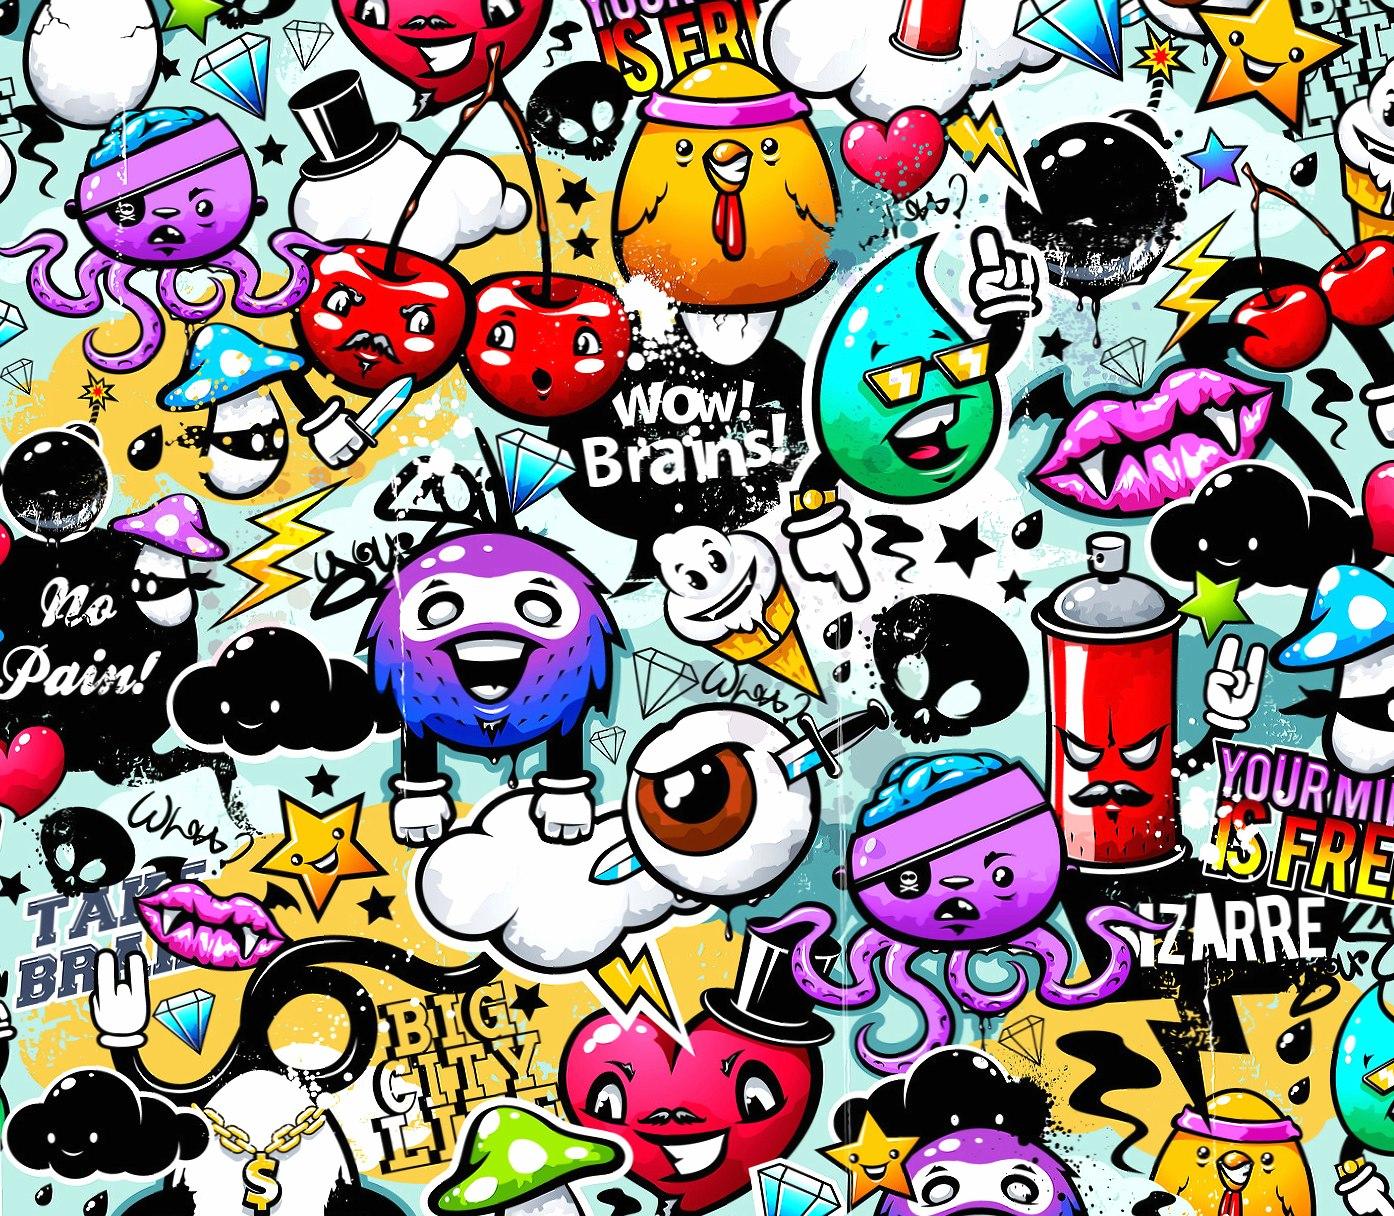 Graffiti wallpapers HD quality